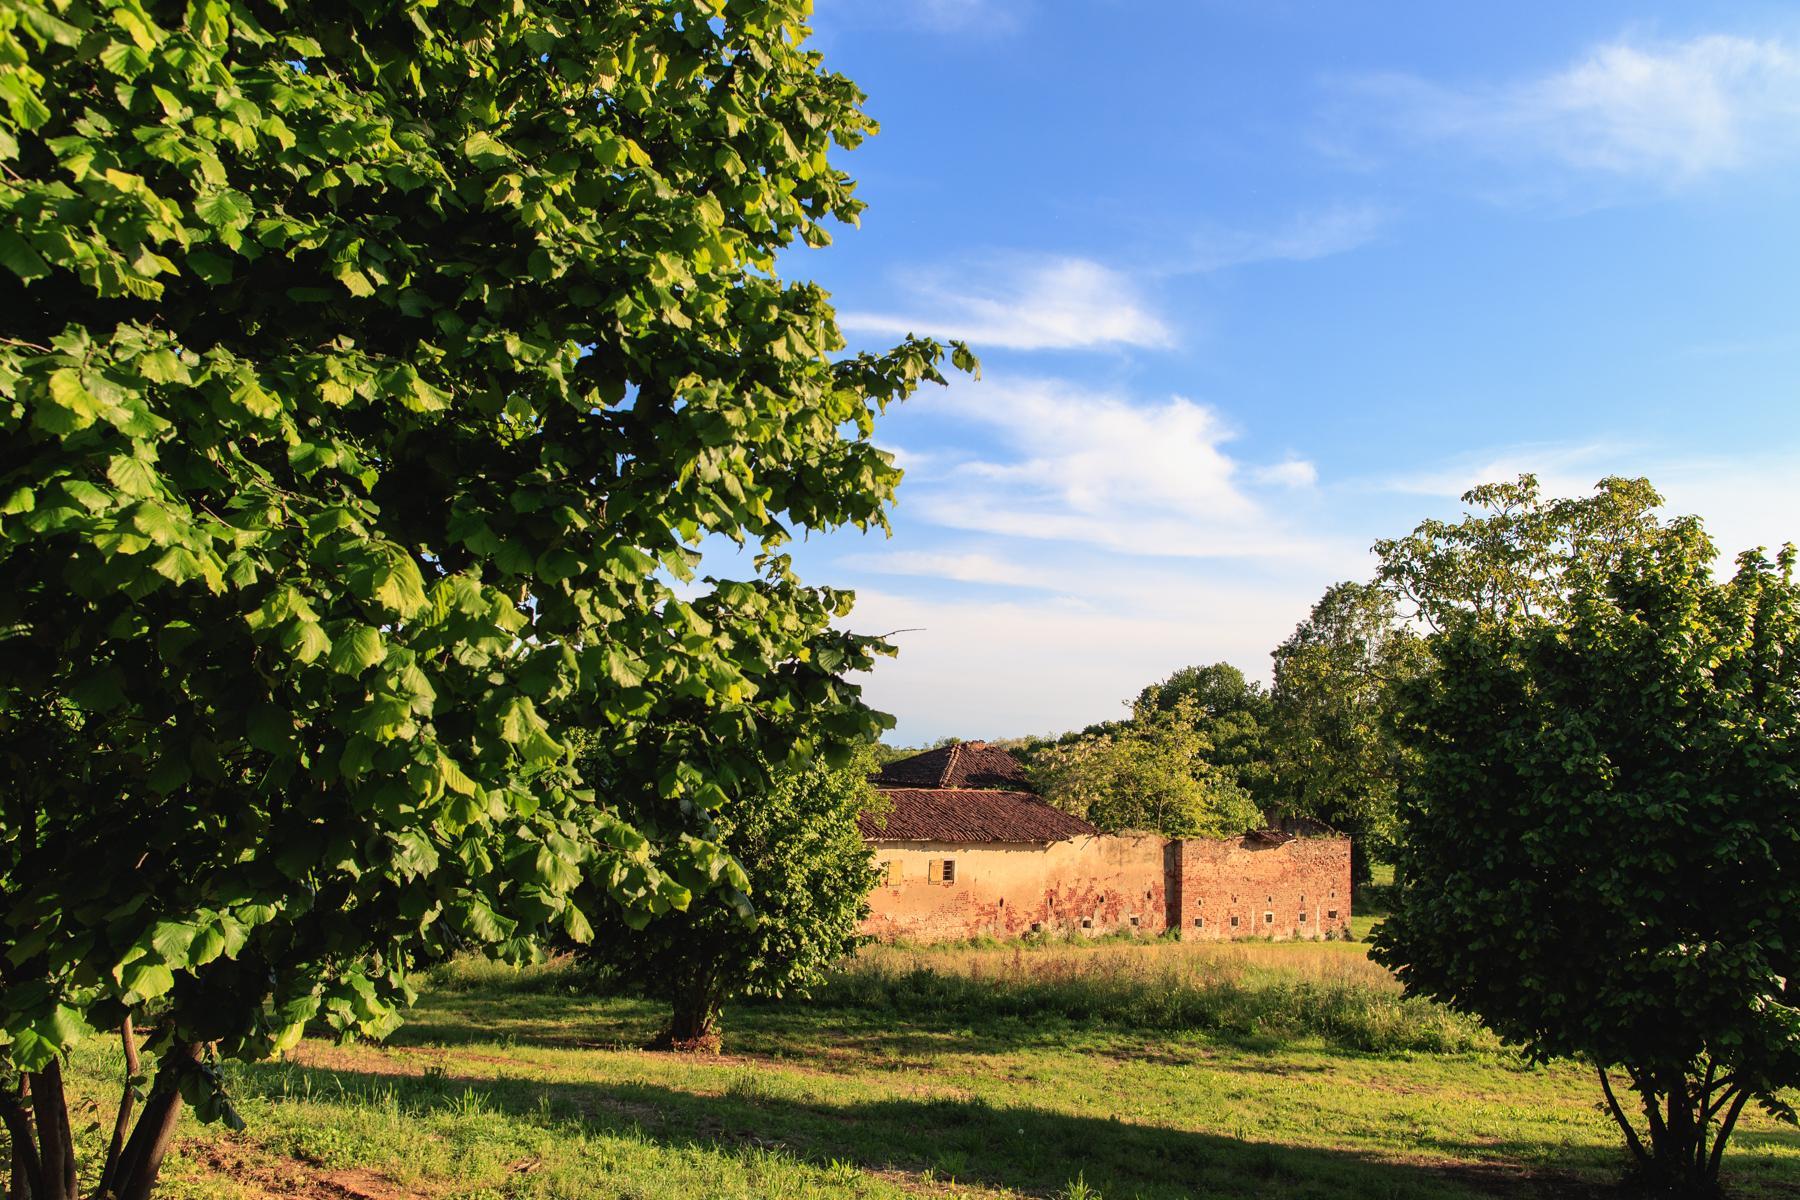 Ancienne ferme dans la campagne de Turin - 12